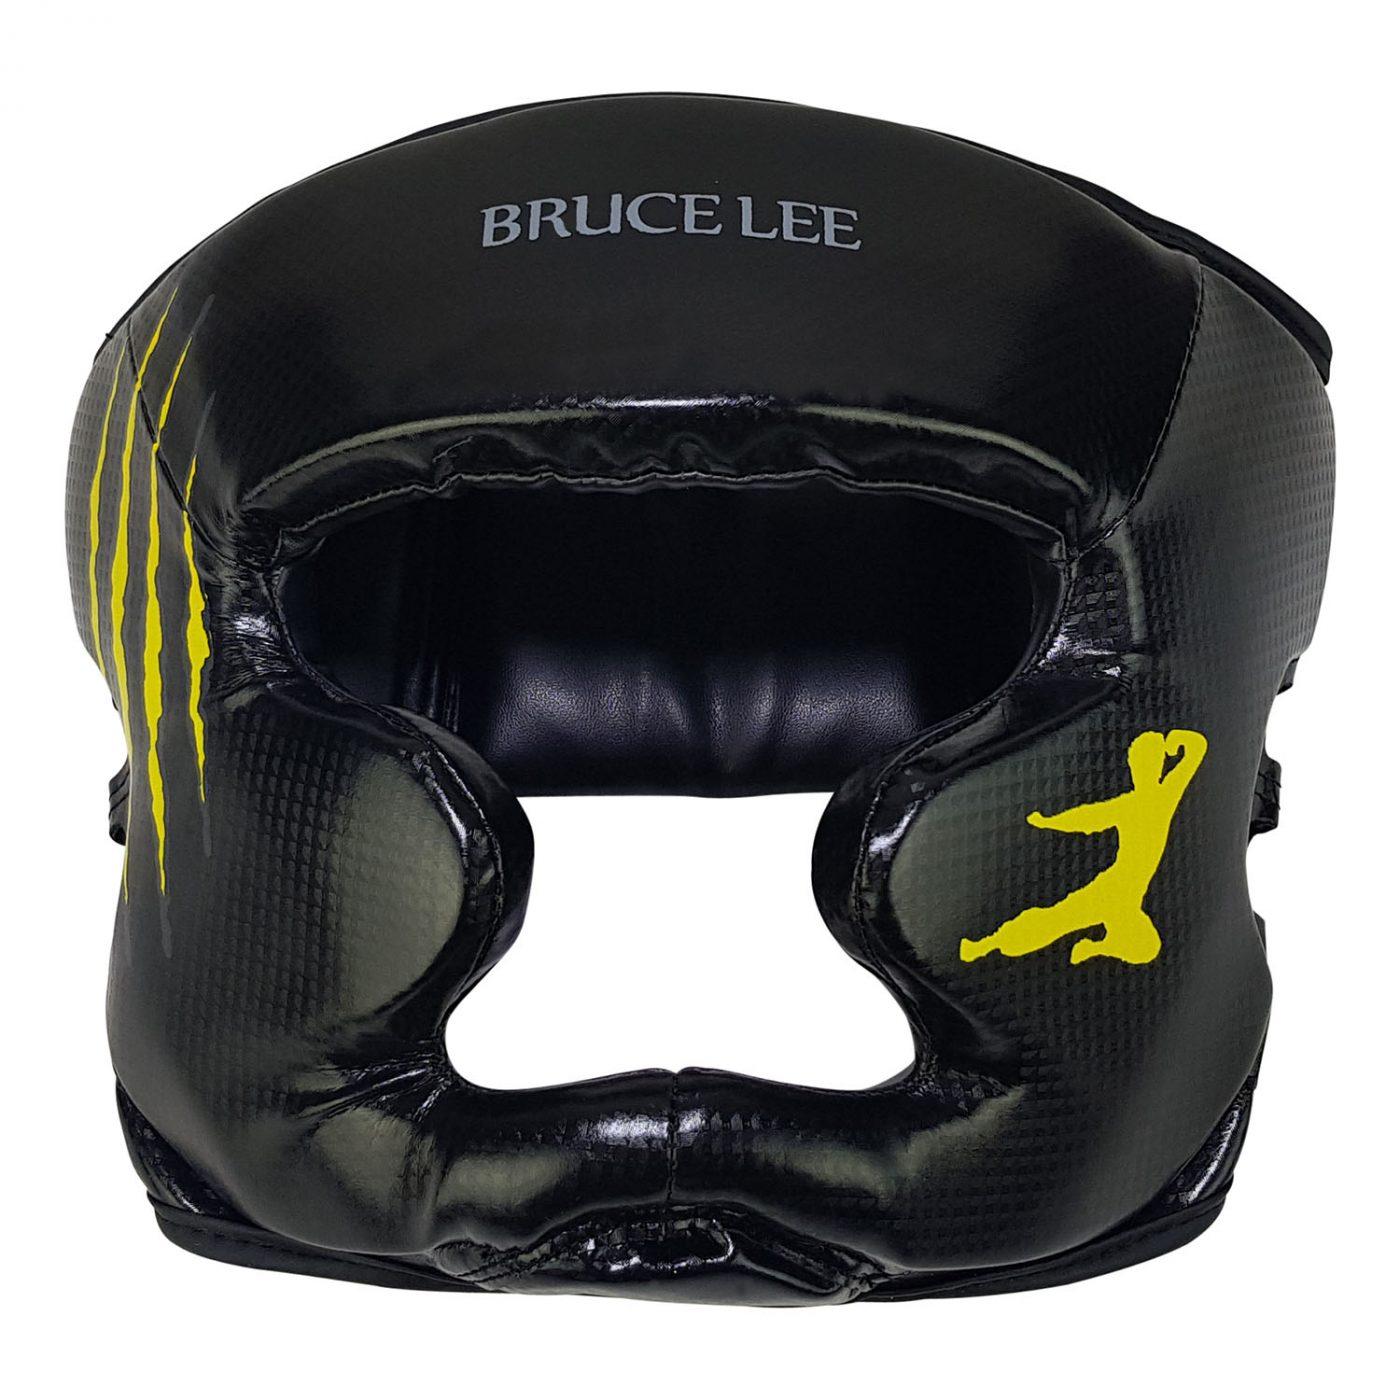 Bruce Lee Signature Hoofdbeschermer - Kickbokshoofdbeschermer - PU